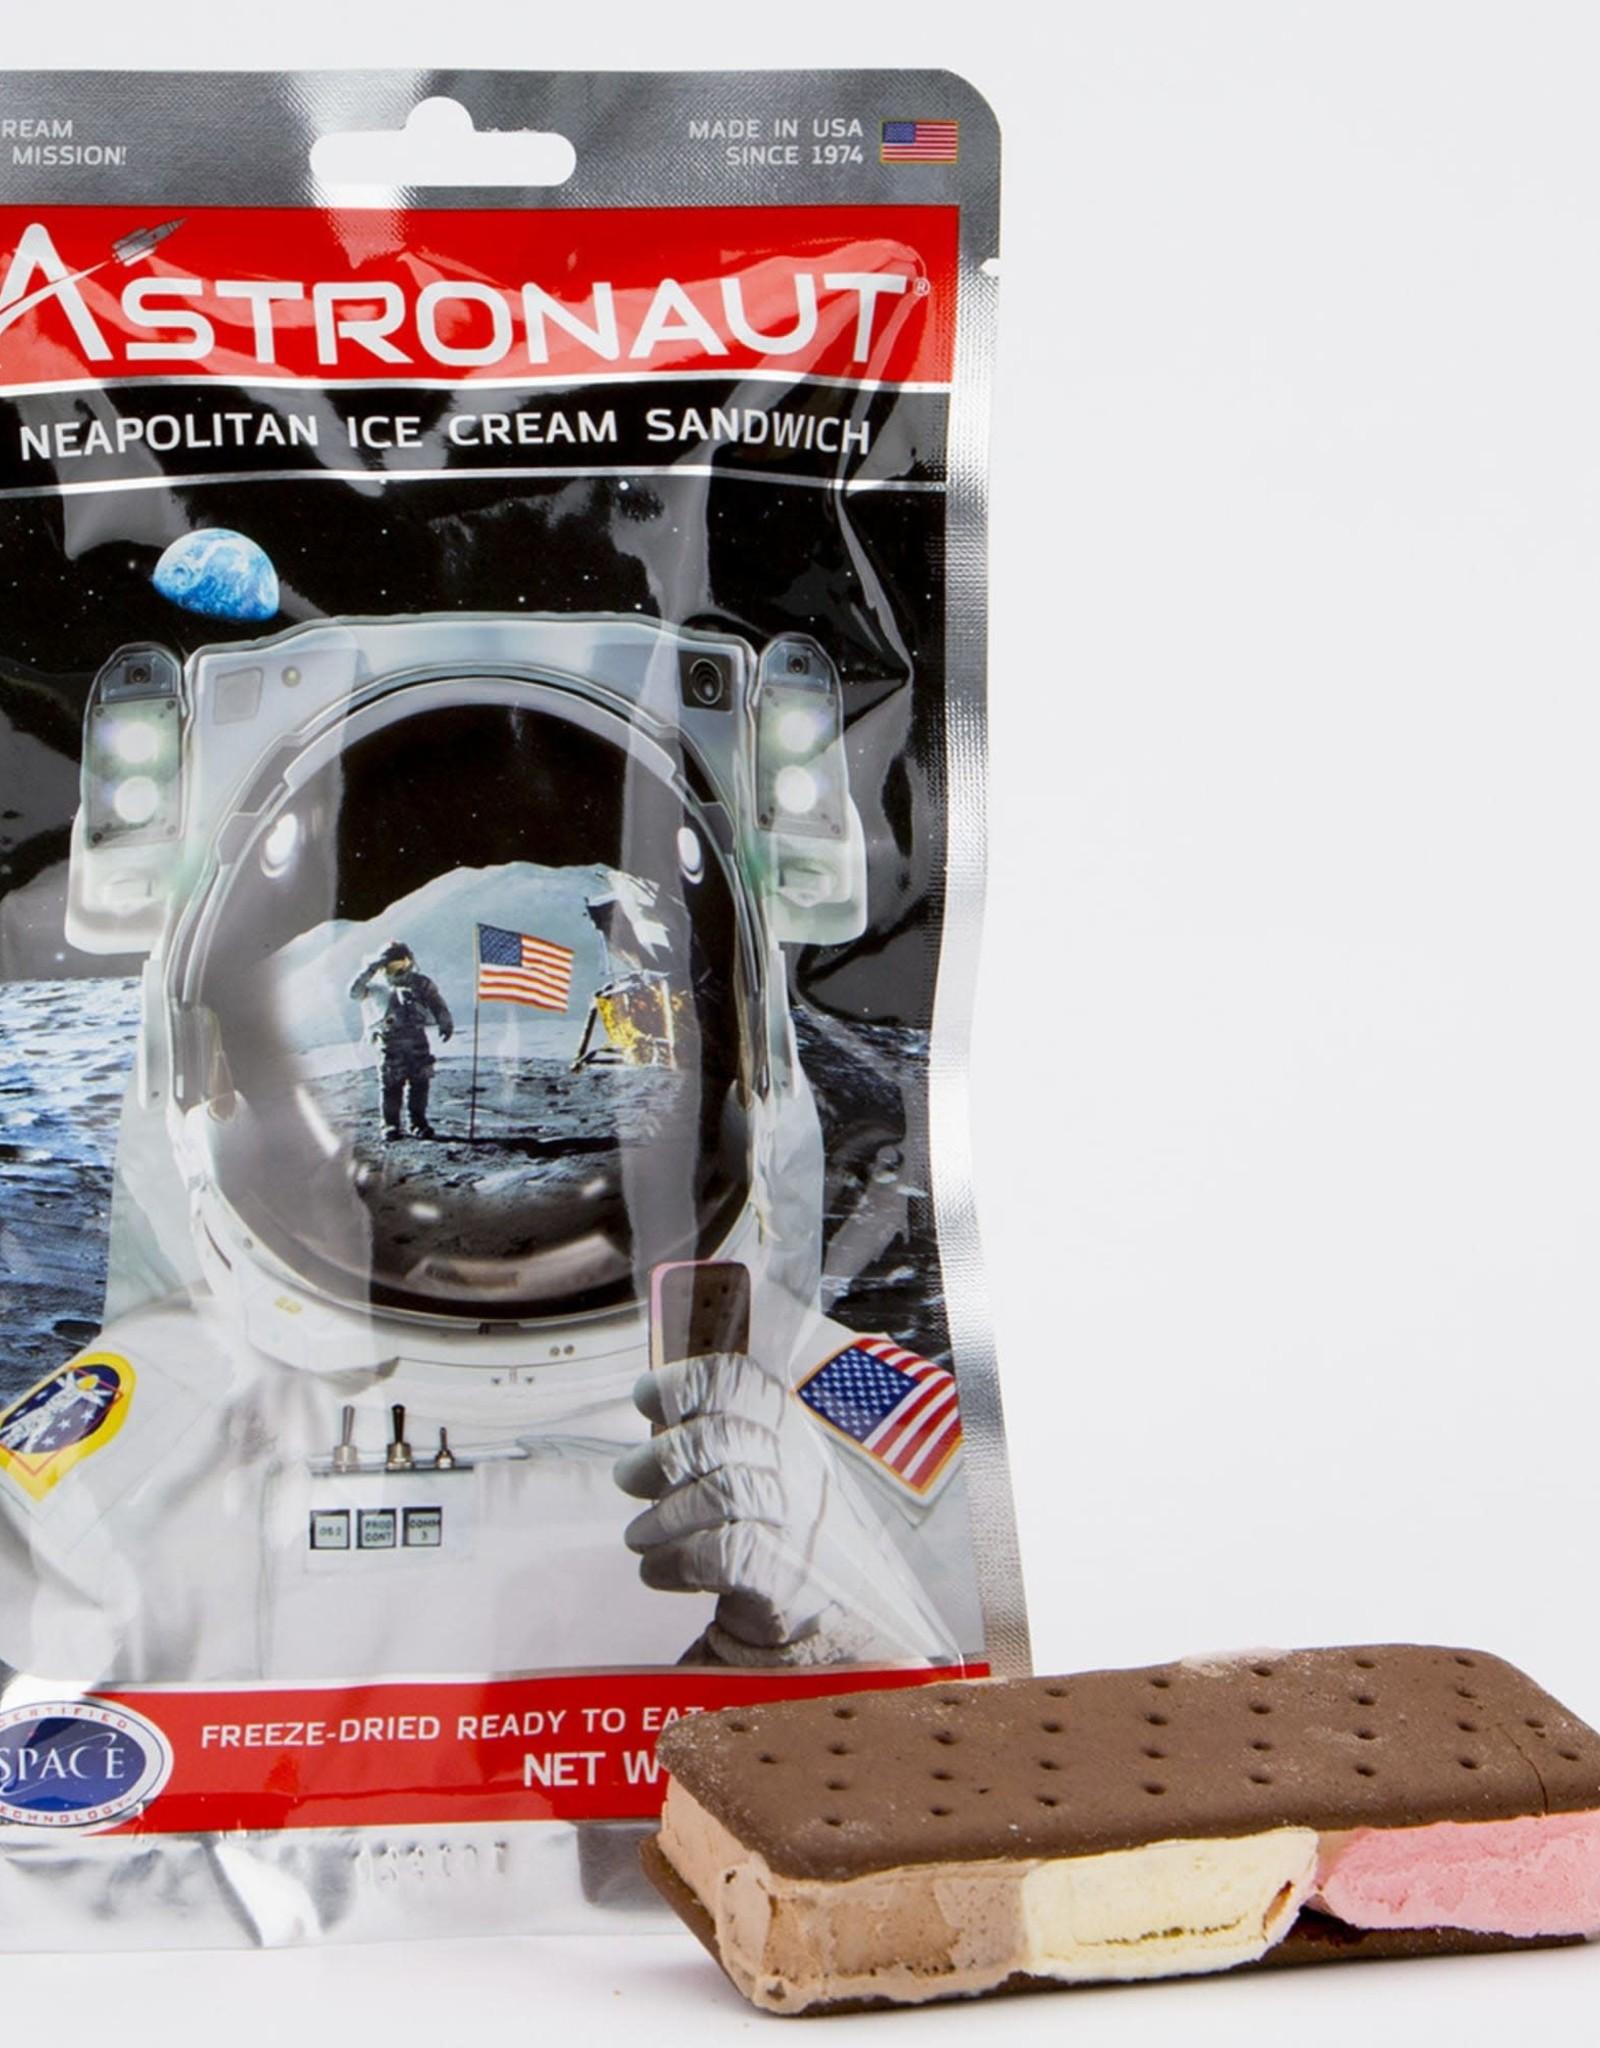 Astronaut Ice Cream - Neapolitan Sandwich